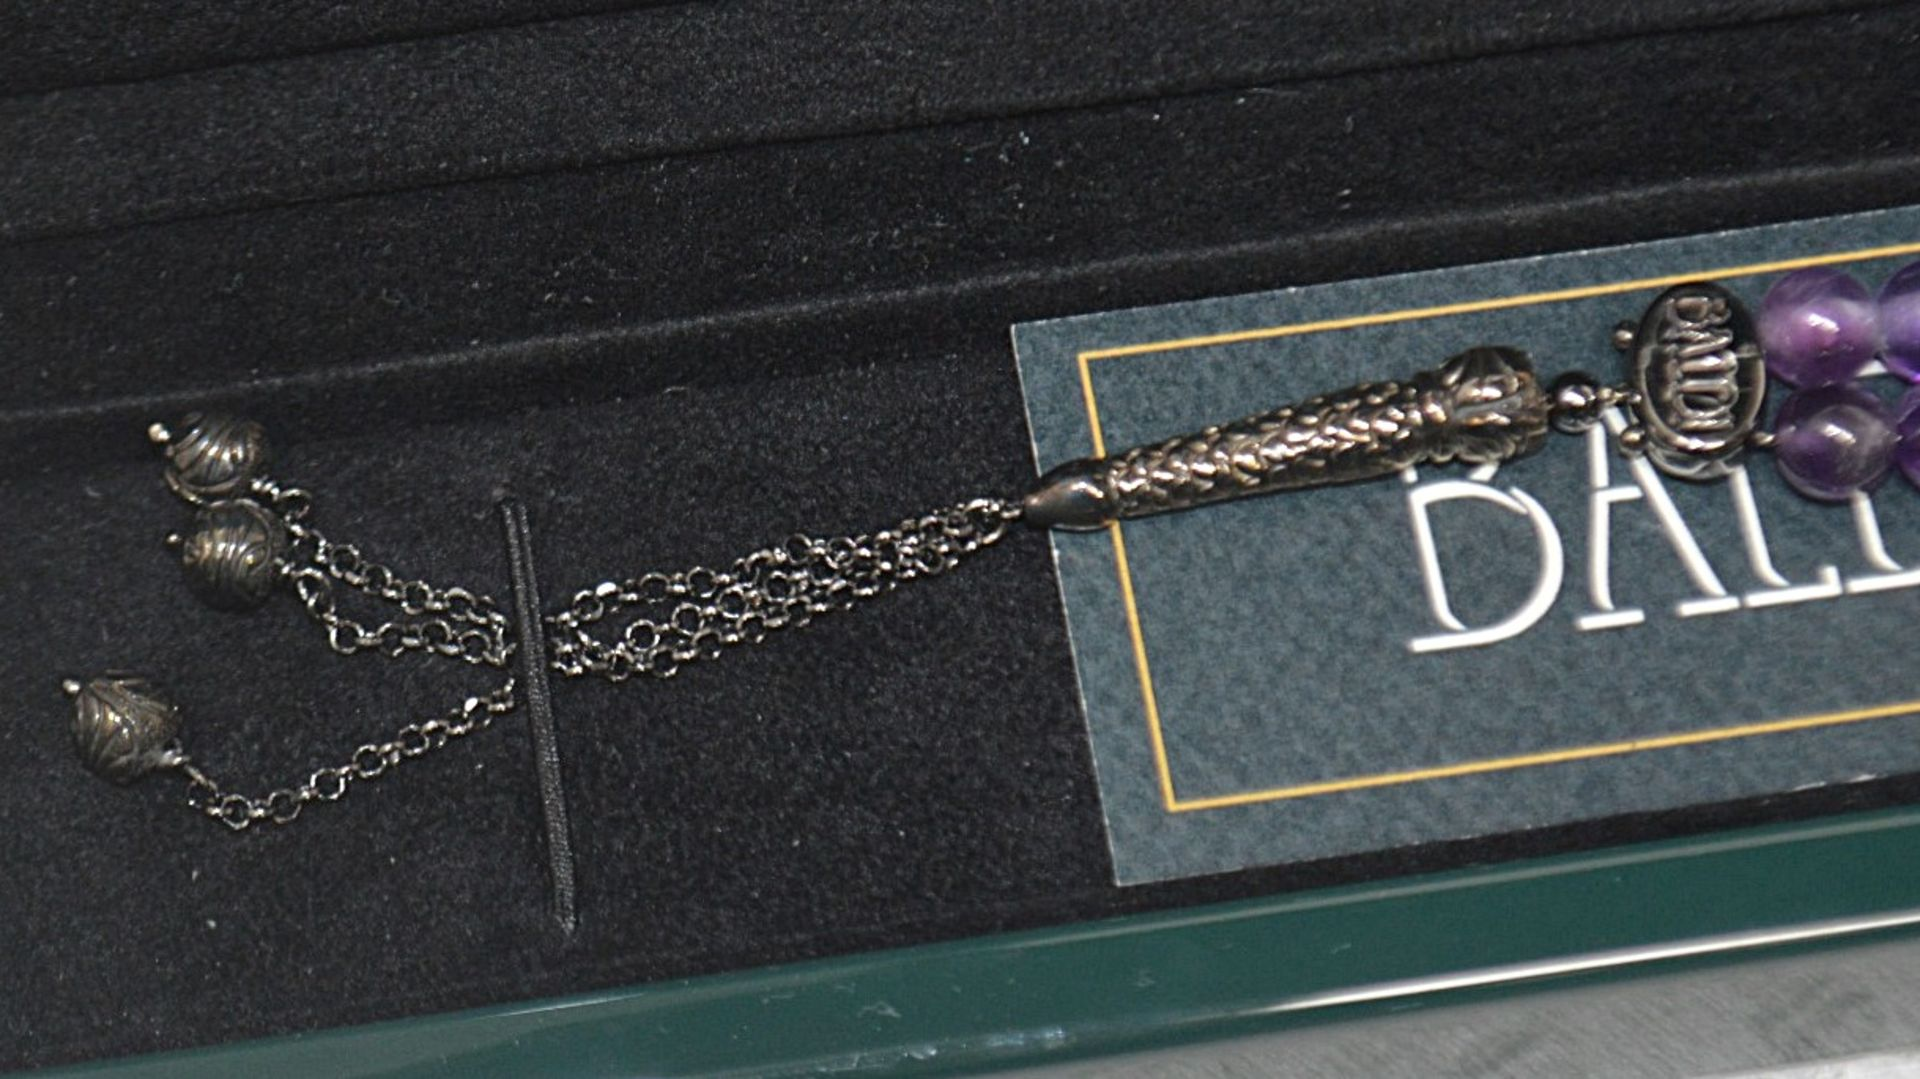 1 x BALDI 'Home Jewels' Italian Hand-crafted Artisan MISBAHA Prayer Beads In Amethyst Gemstone And - Image 4 of 7